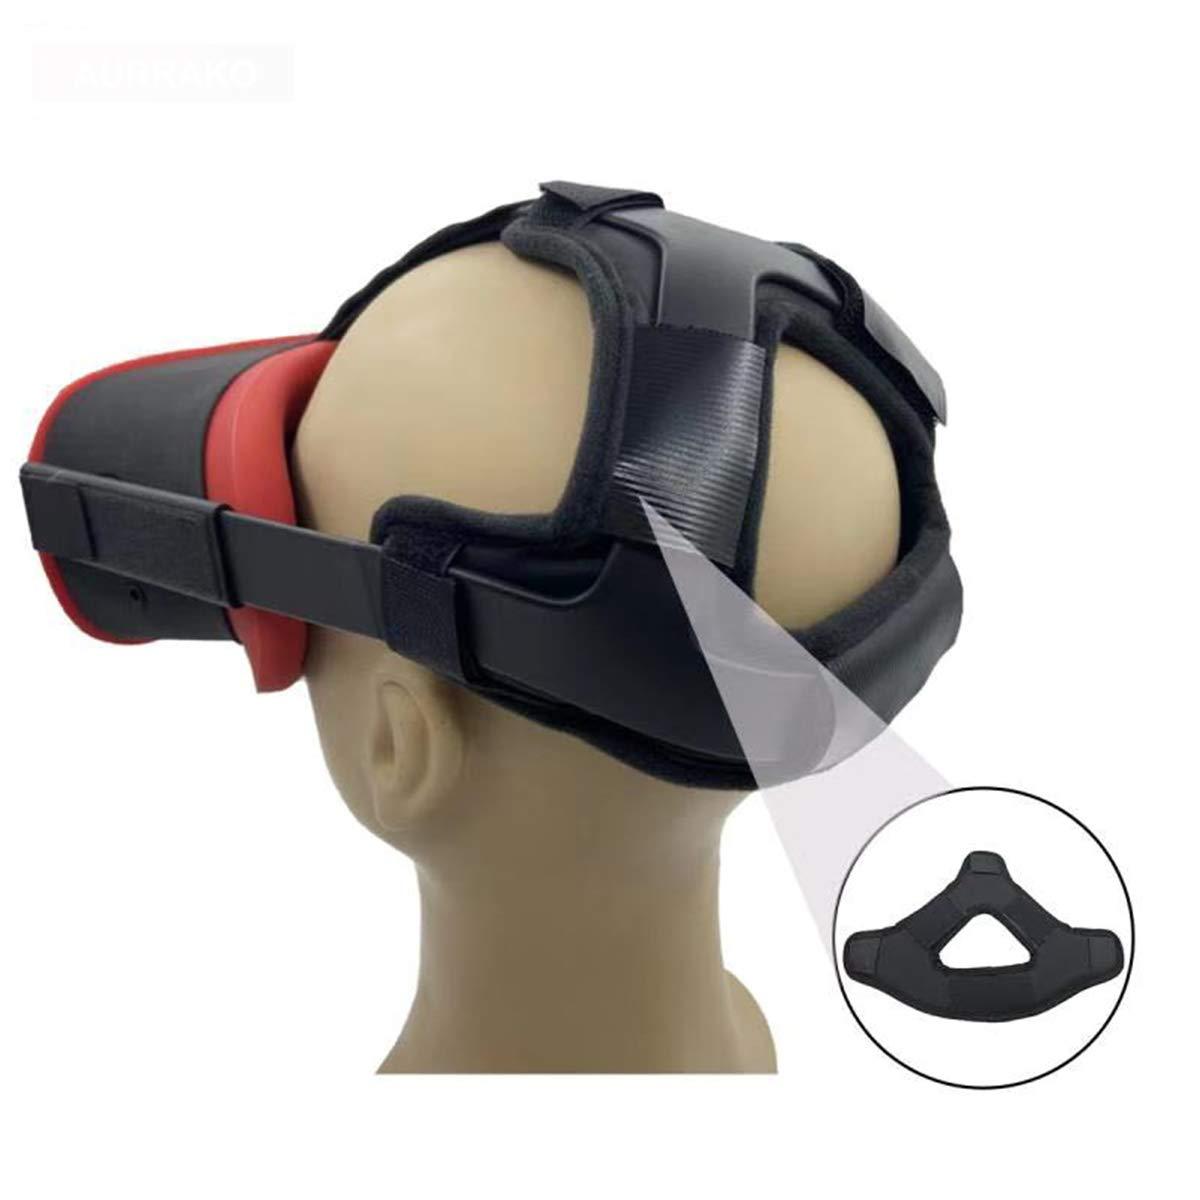 Aurrako Head Strap Headband for Oculus Quest Virtual Reality VR Headset Accessories, Comfortable PU Leather & Reduce Head Pressure (Black) 51tQj7W2JmL